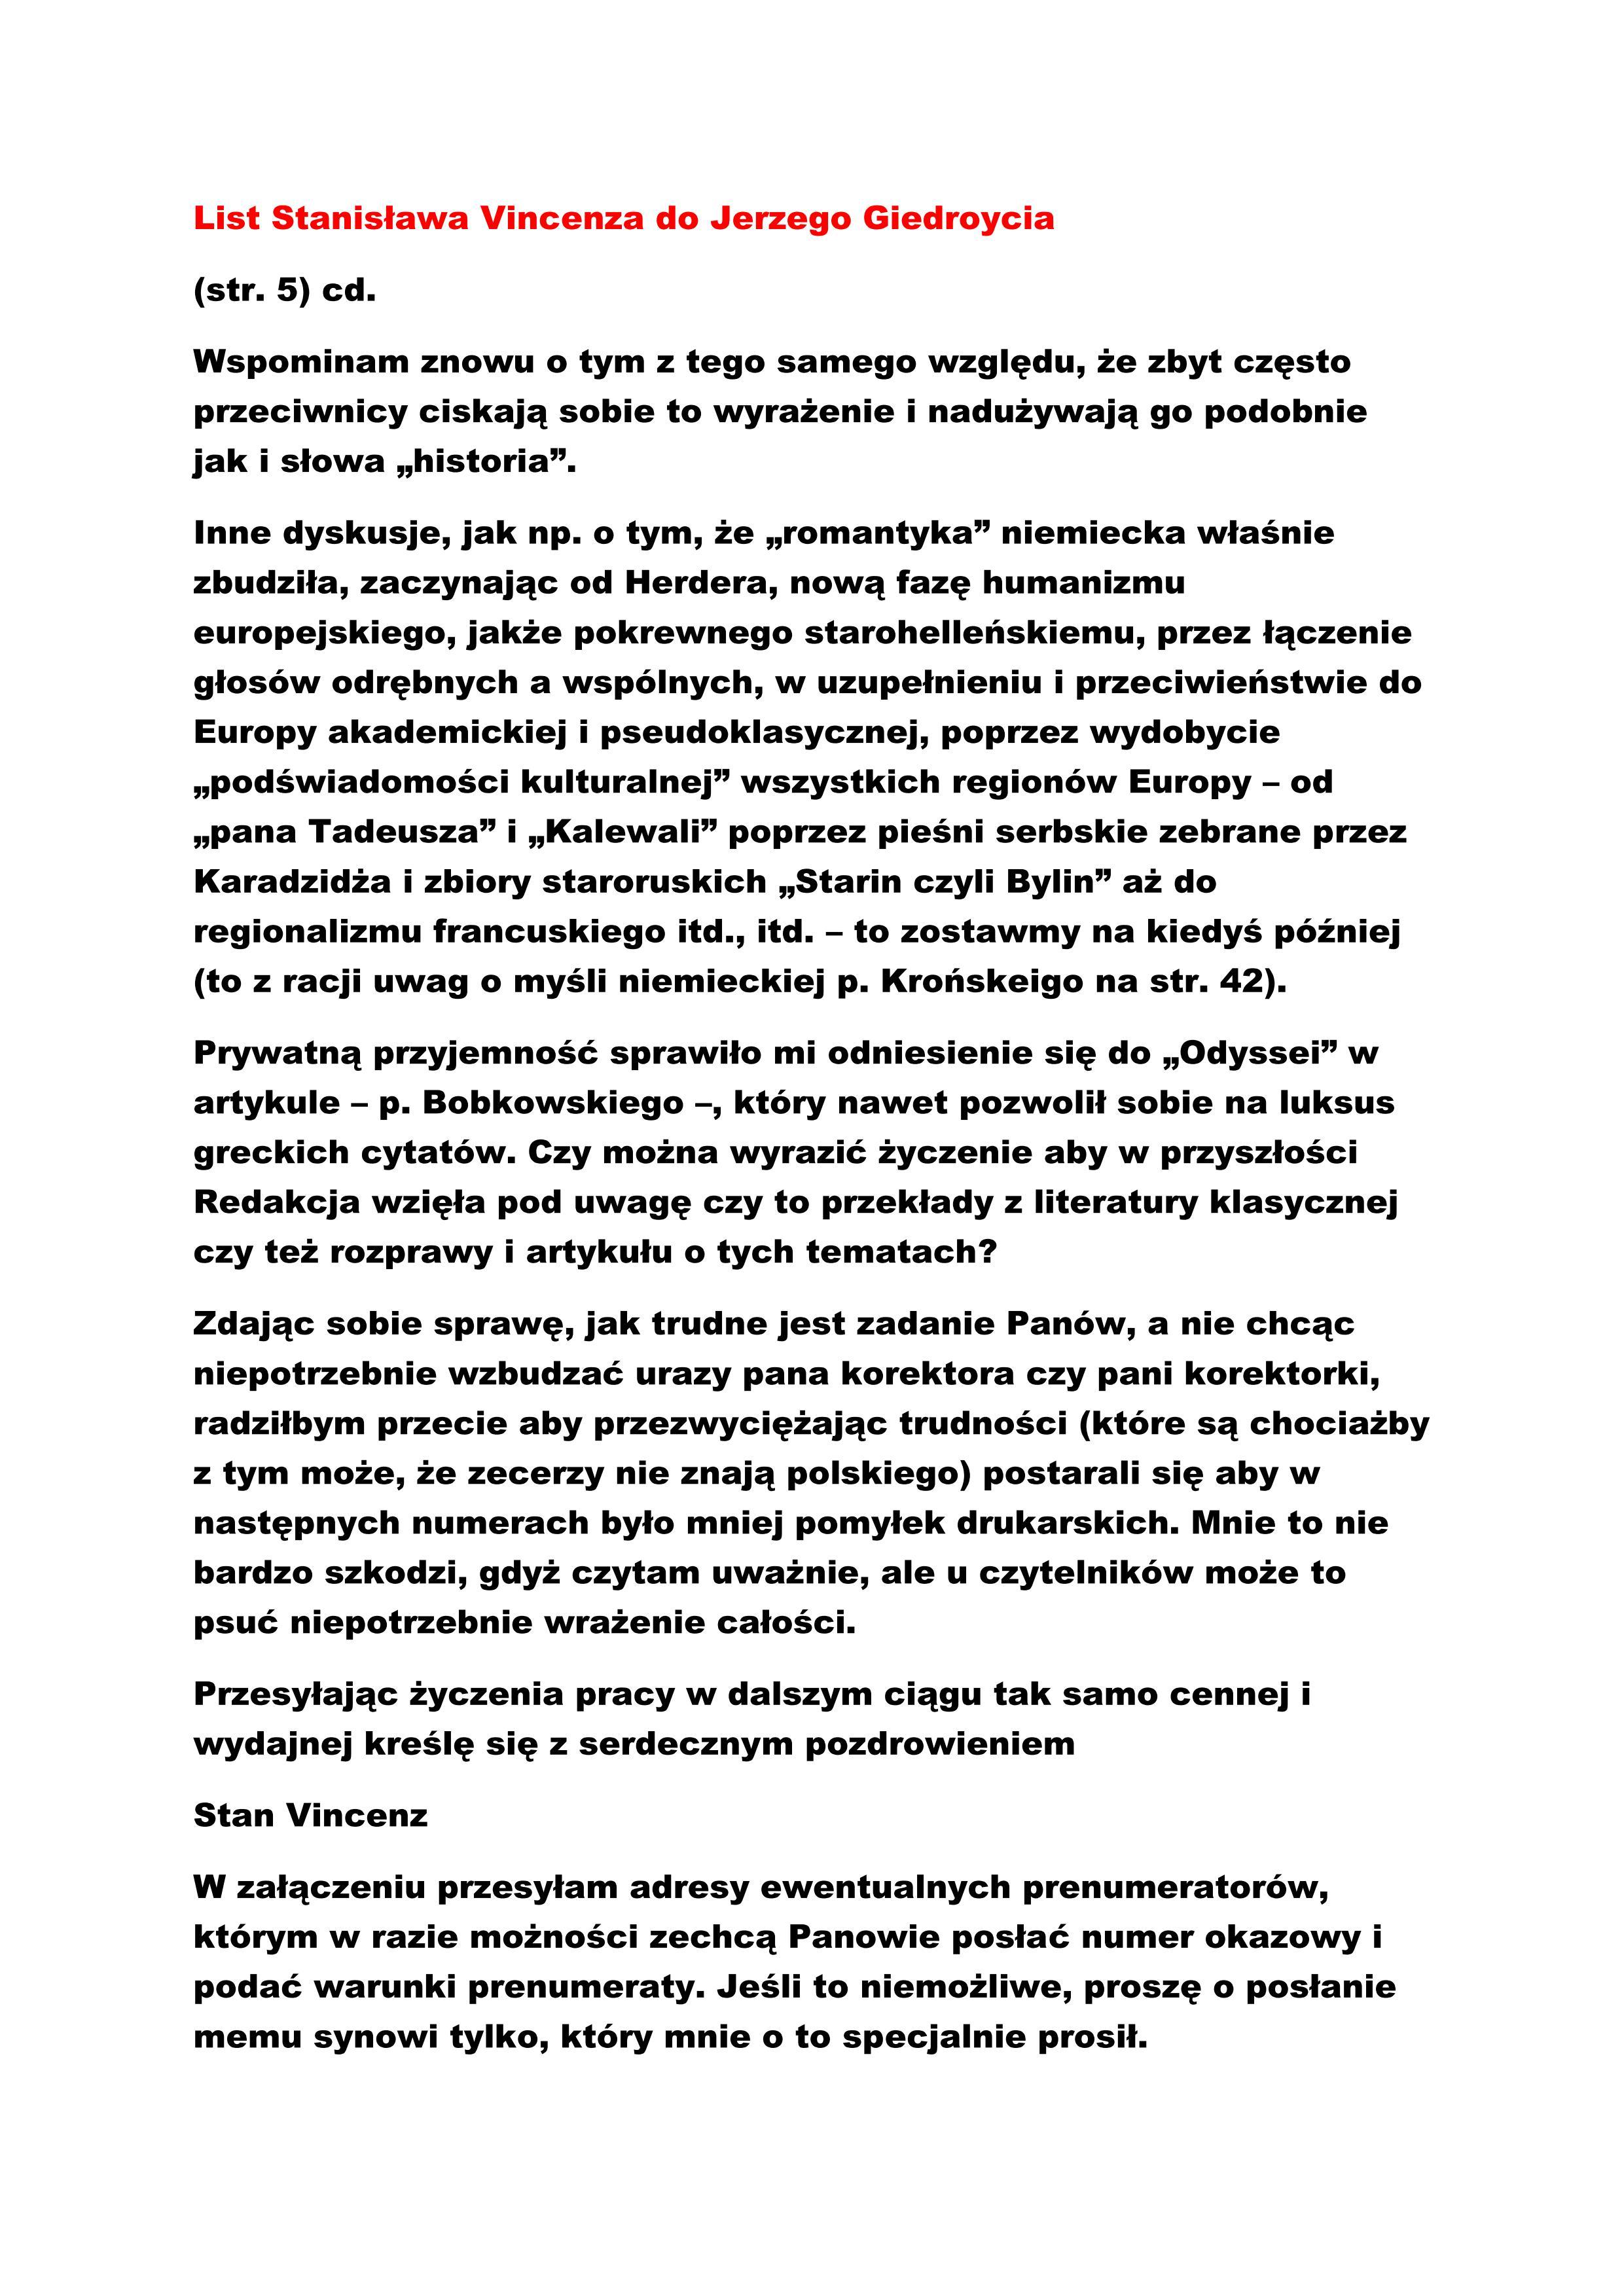 <div class='inner-box'><div class='close-desc'></div><span class='opis'>List Stanisława Vincenza na temat pierwszego numeru &quot;Kultury&quot; (str. 5)</span><div class='clearfix'></div><span>Sygn. sm00315</span><div class='clearfix'></div><span>&copy; Instytut Literacki</span></div>